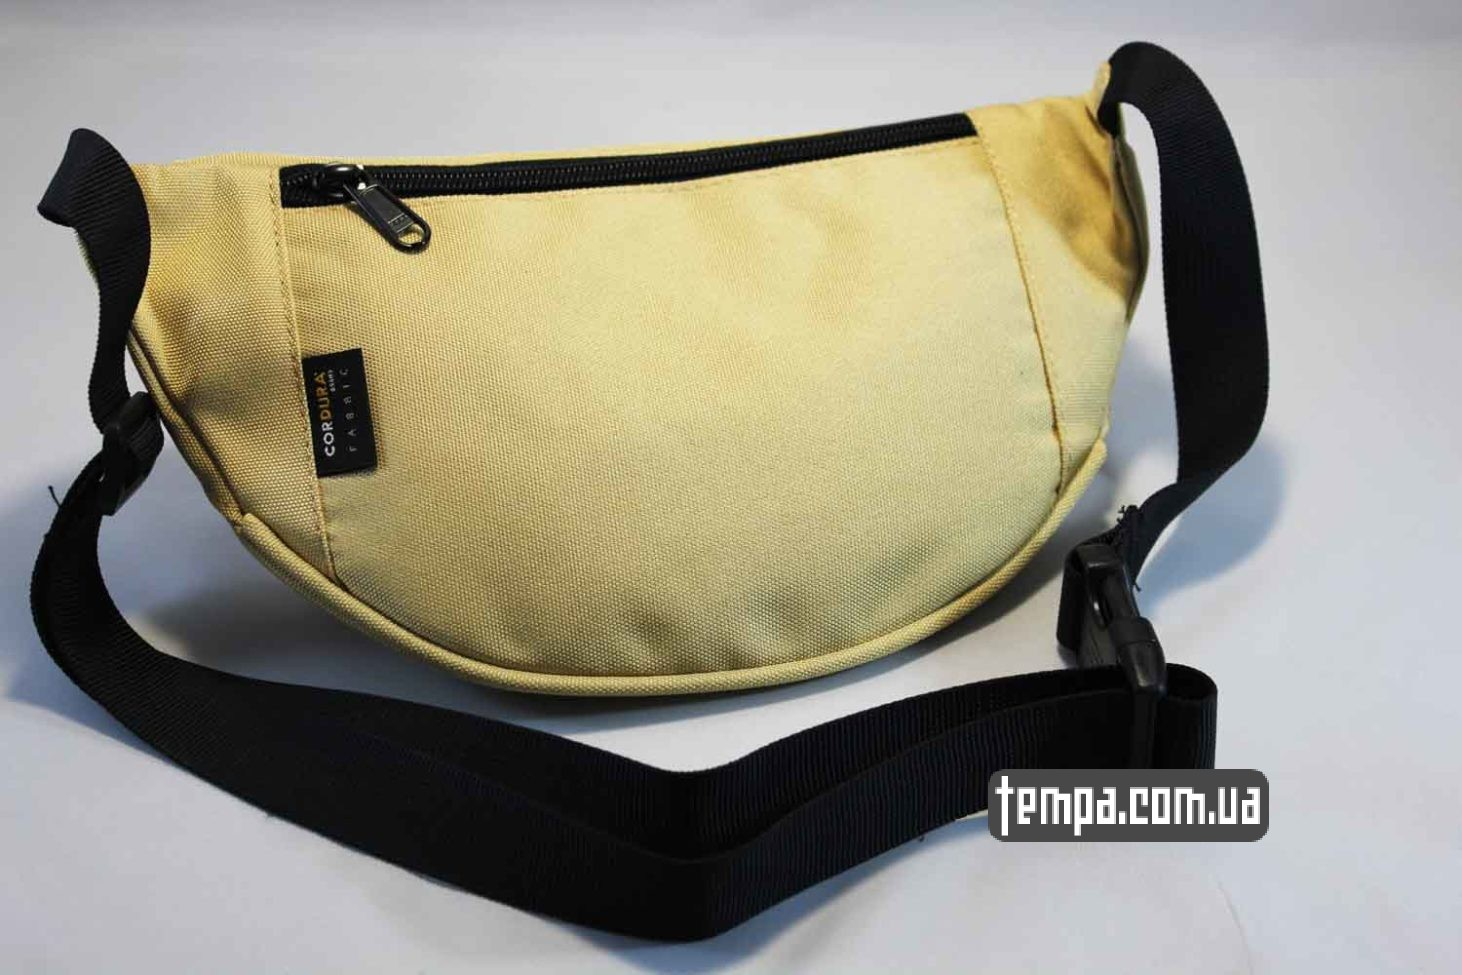 carhartt магазин оригинал сумка на пояс бананка Carhartt Fanny Pack бежевая белая купить